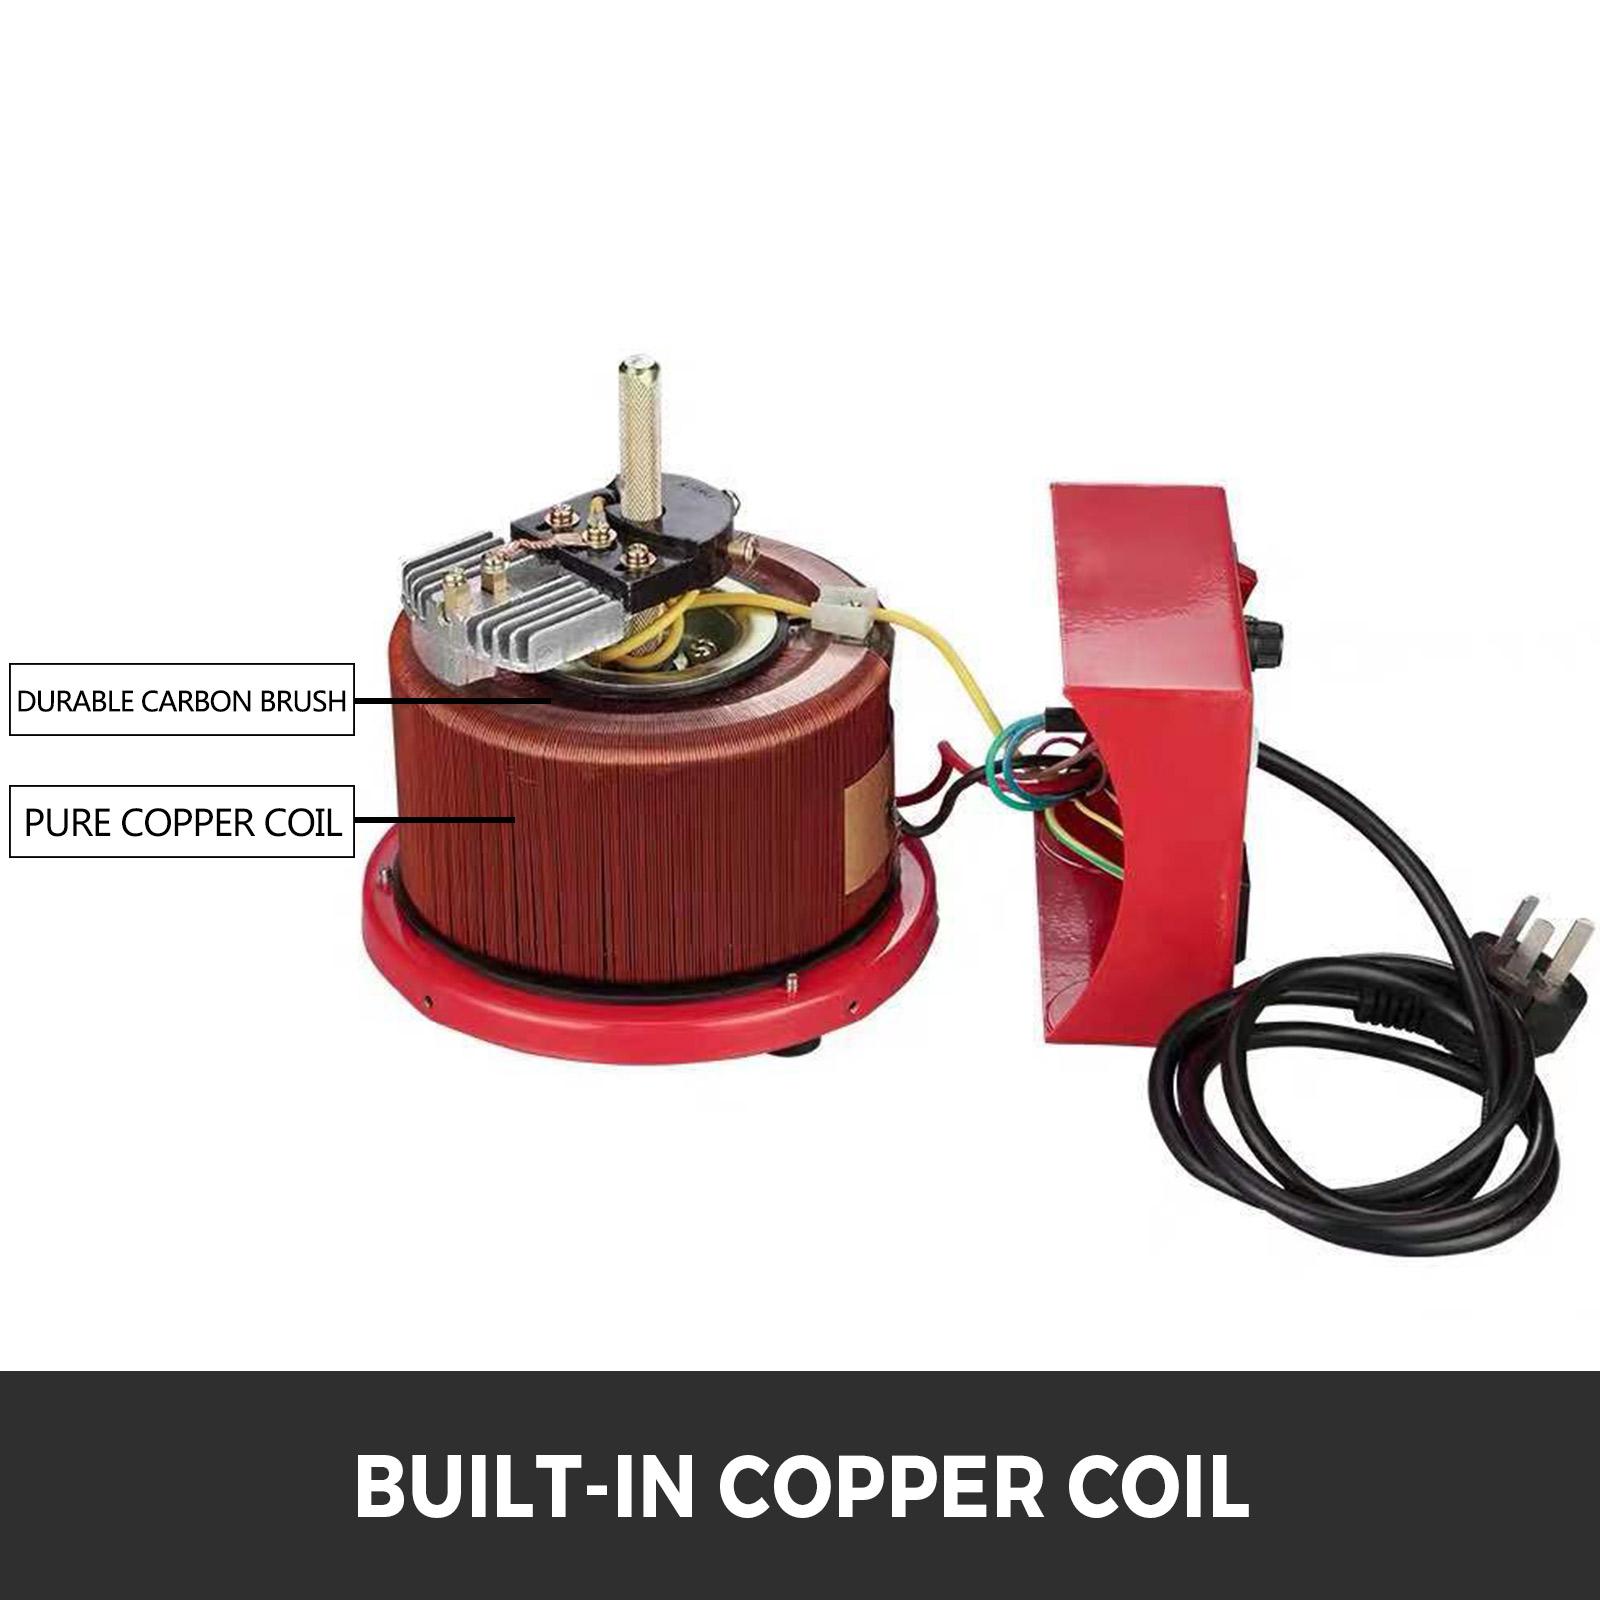 Auto-Variac-Variable-Transformer-0-5-1-2-3KVA-Regulator-pure-copper-coil-220V thumbnail 38